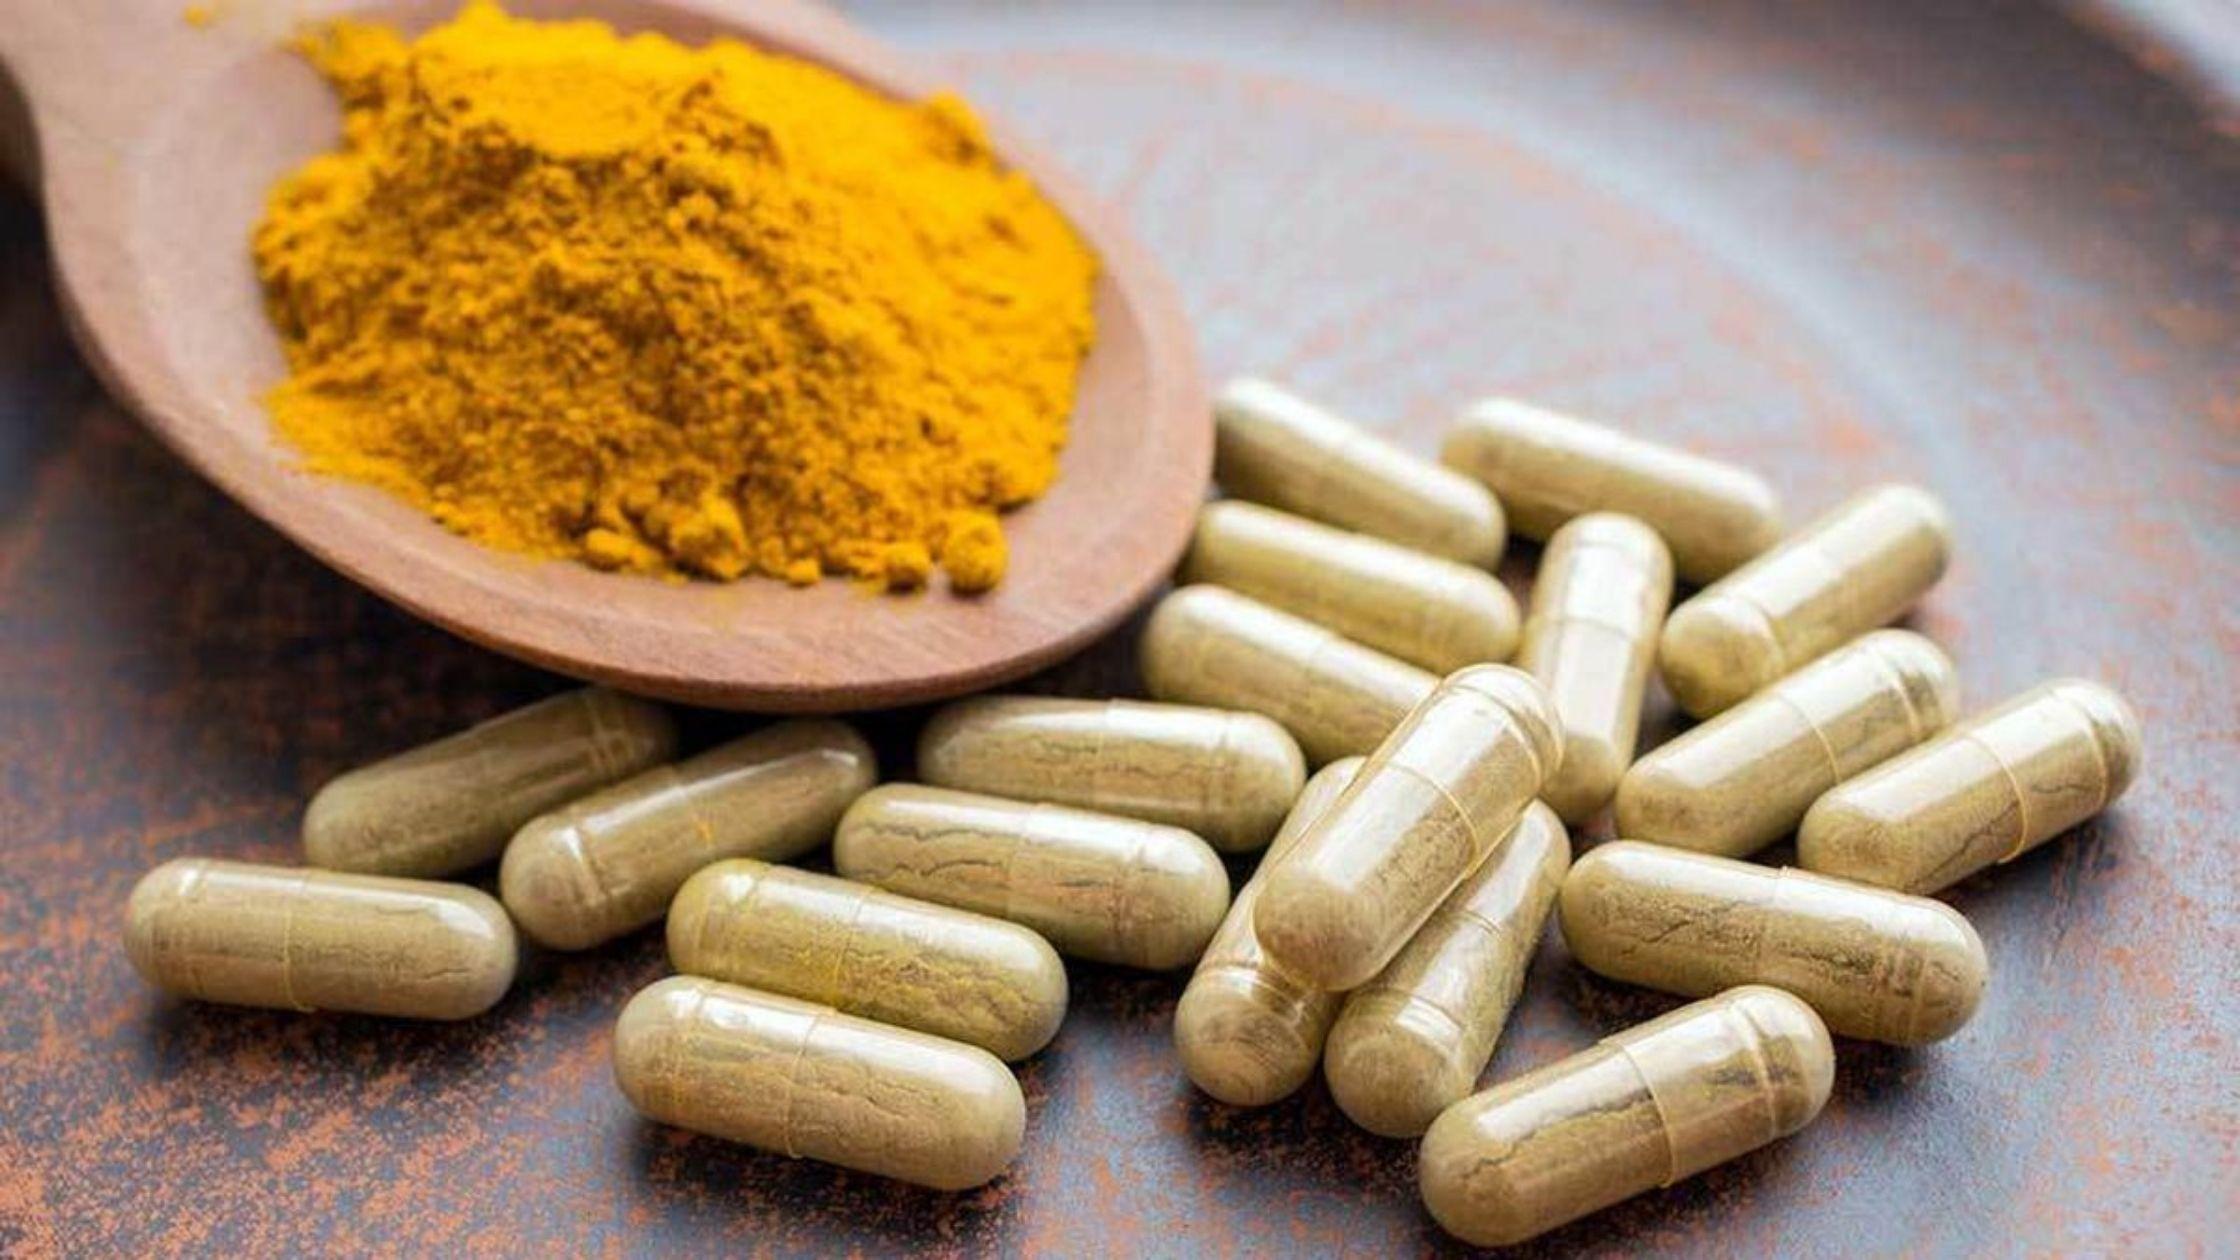 Best 5 Turmeric Curcumin Supplements